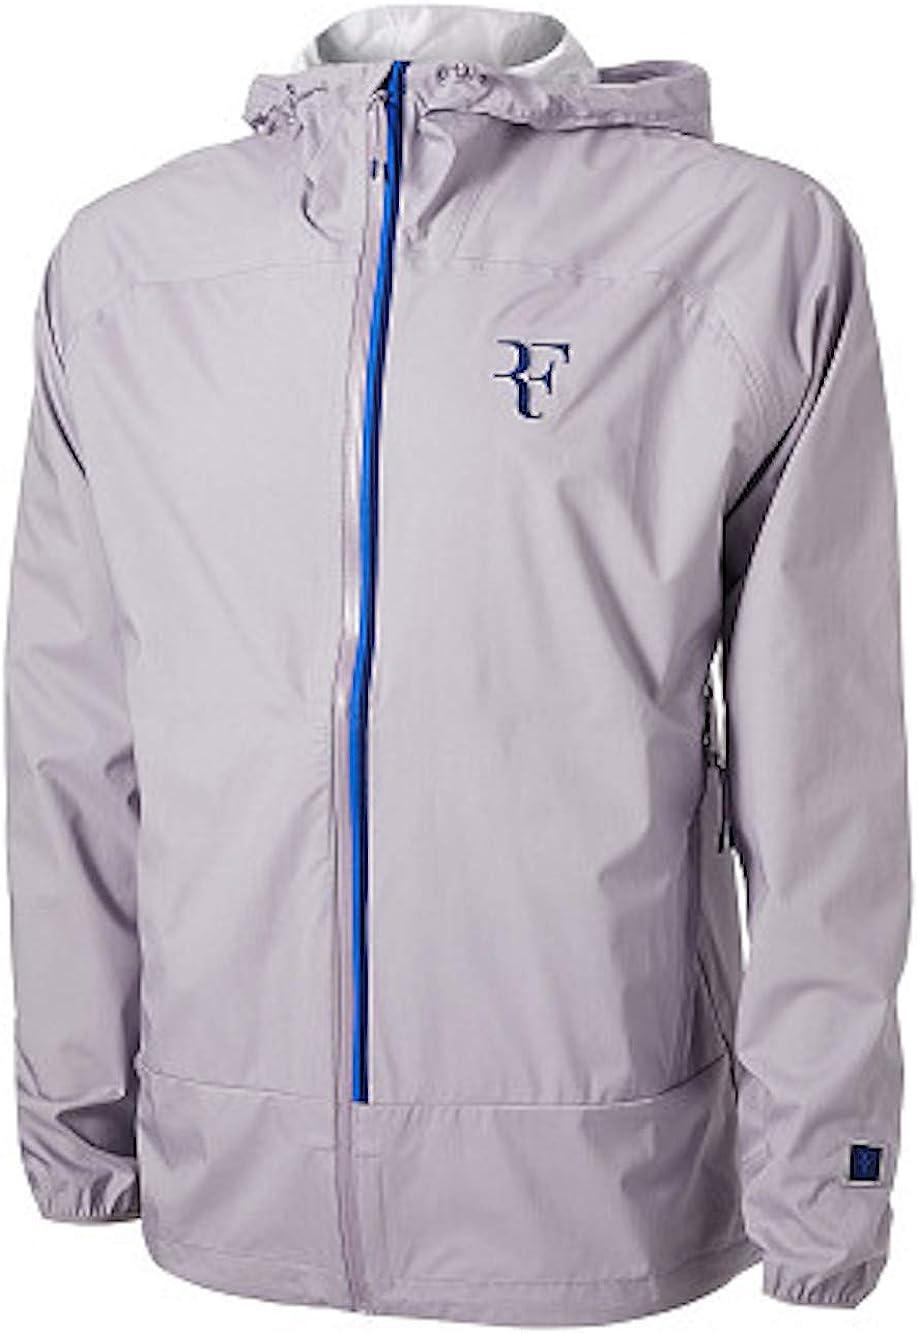 Nike Mens Rf Rafael Nadal Windbreaker Tennis Jacket Gray Blue Size Large Ah8385 573 Exercise Fitness Amazon Canada